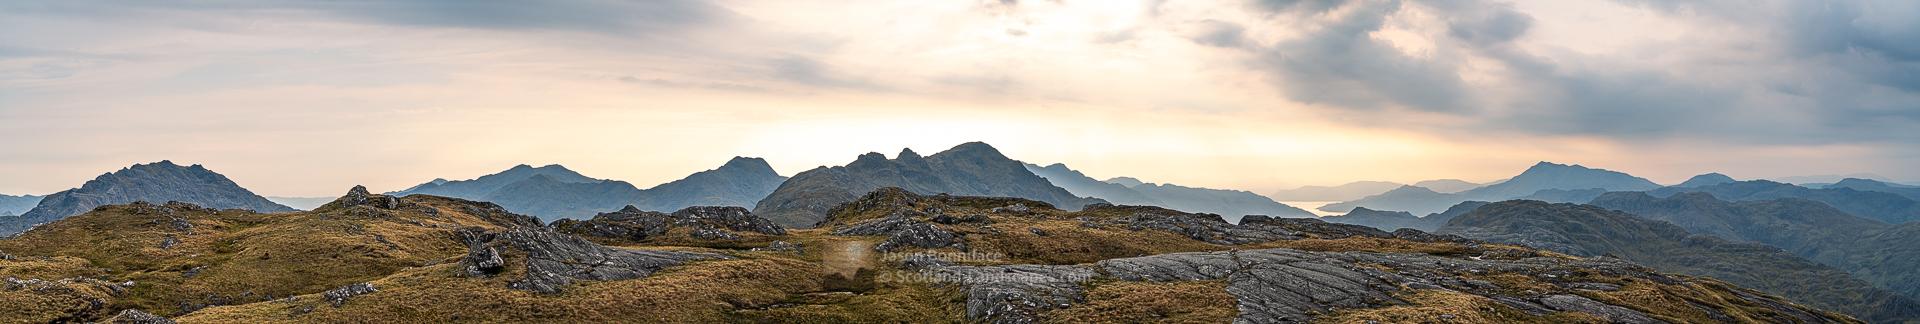 A Westerly Panorama from Sgurr Airigh na Beinne, Lochalsh & Knoydart